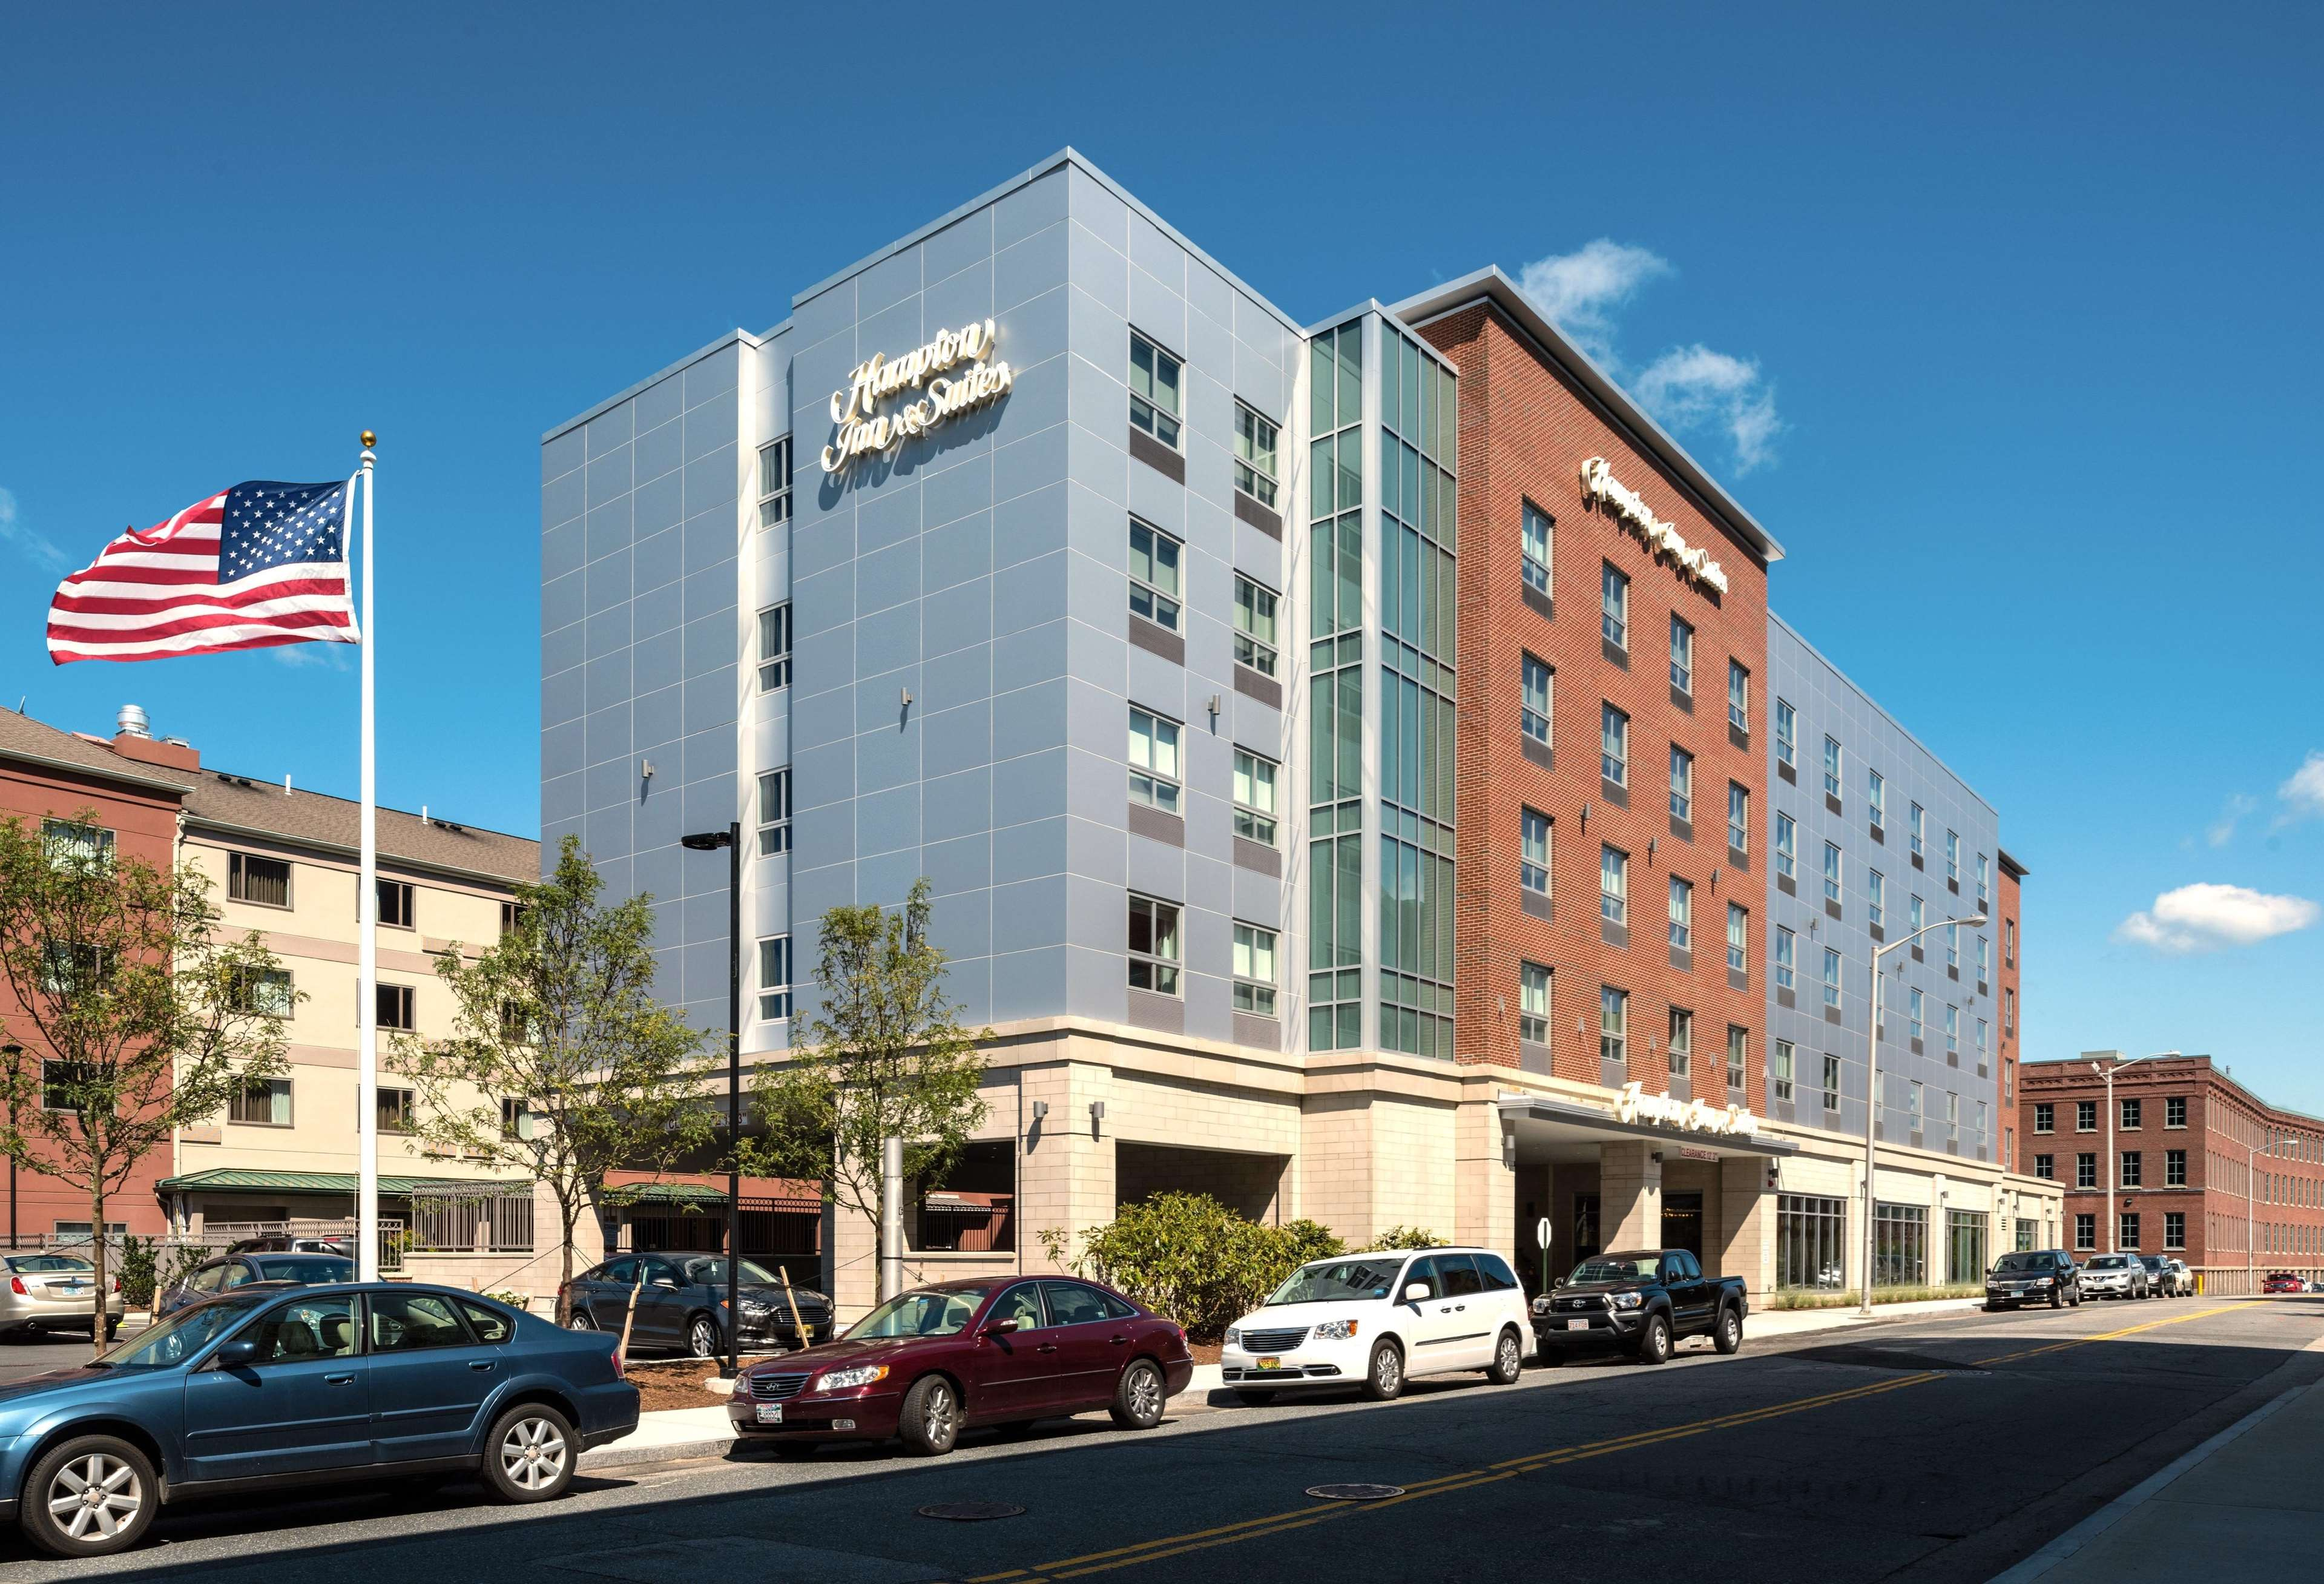 Hampton Inn & Suites Worcester image 40